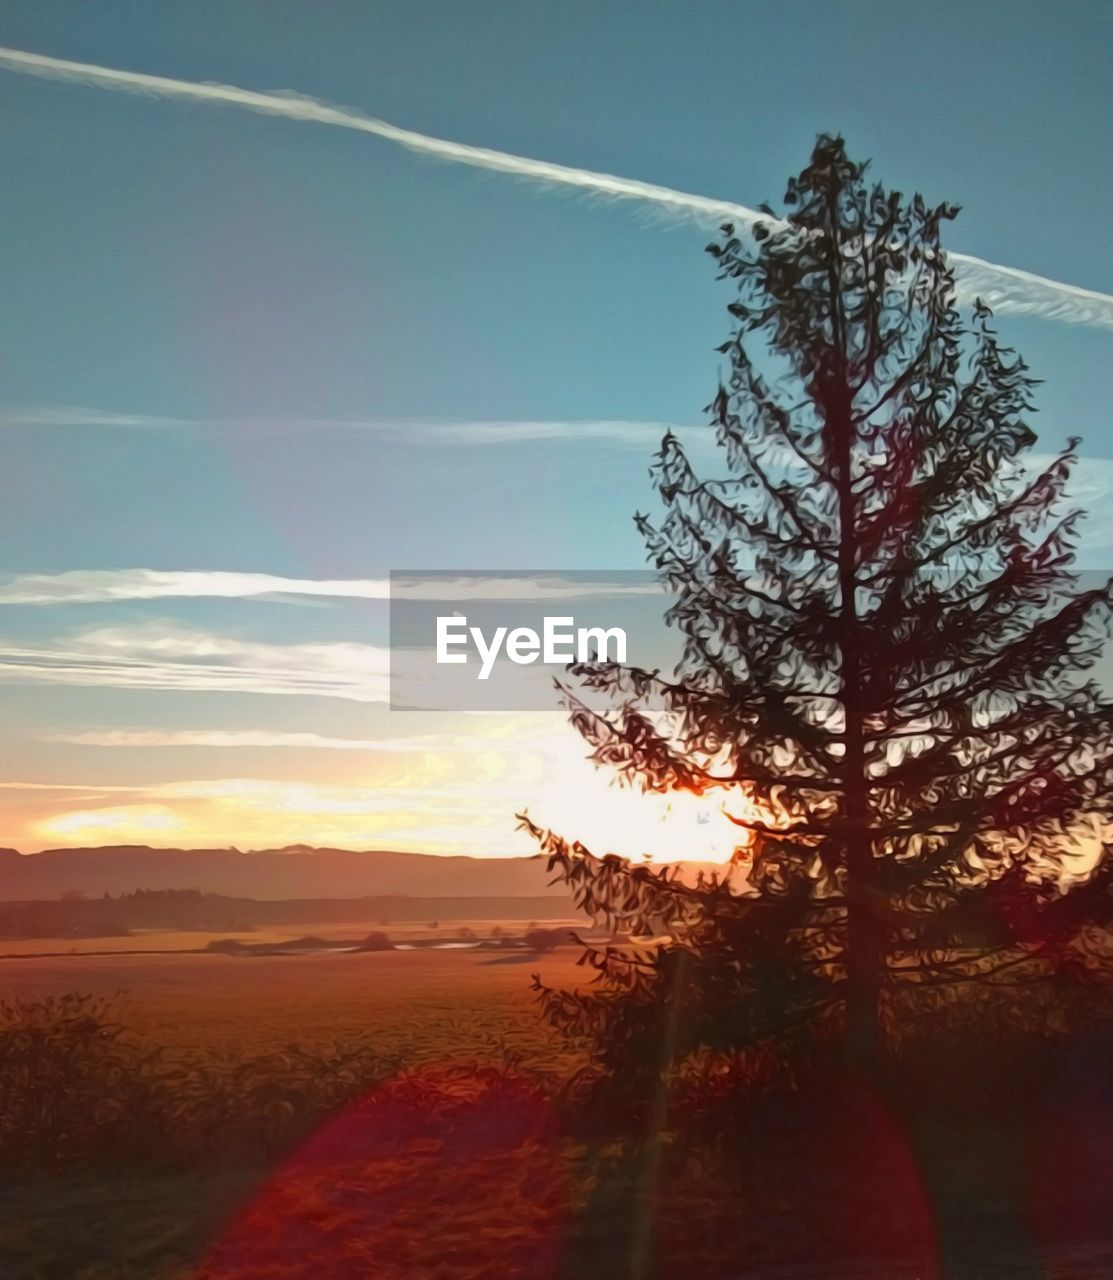 sky, sunset, plant, tree, beauty in nature, tranquil scene, tranquility, scenics - nature, nature, landscape, environment, growth, no people, sunlight, cloud - sky, non-urban scene, silhouette, field, idyllic, land, sun, outdoors, vapor trail